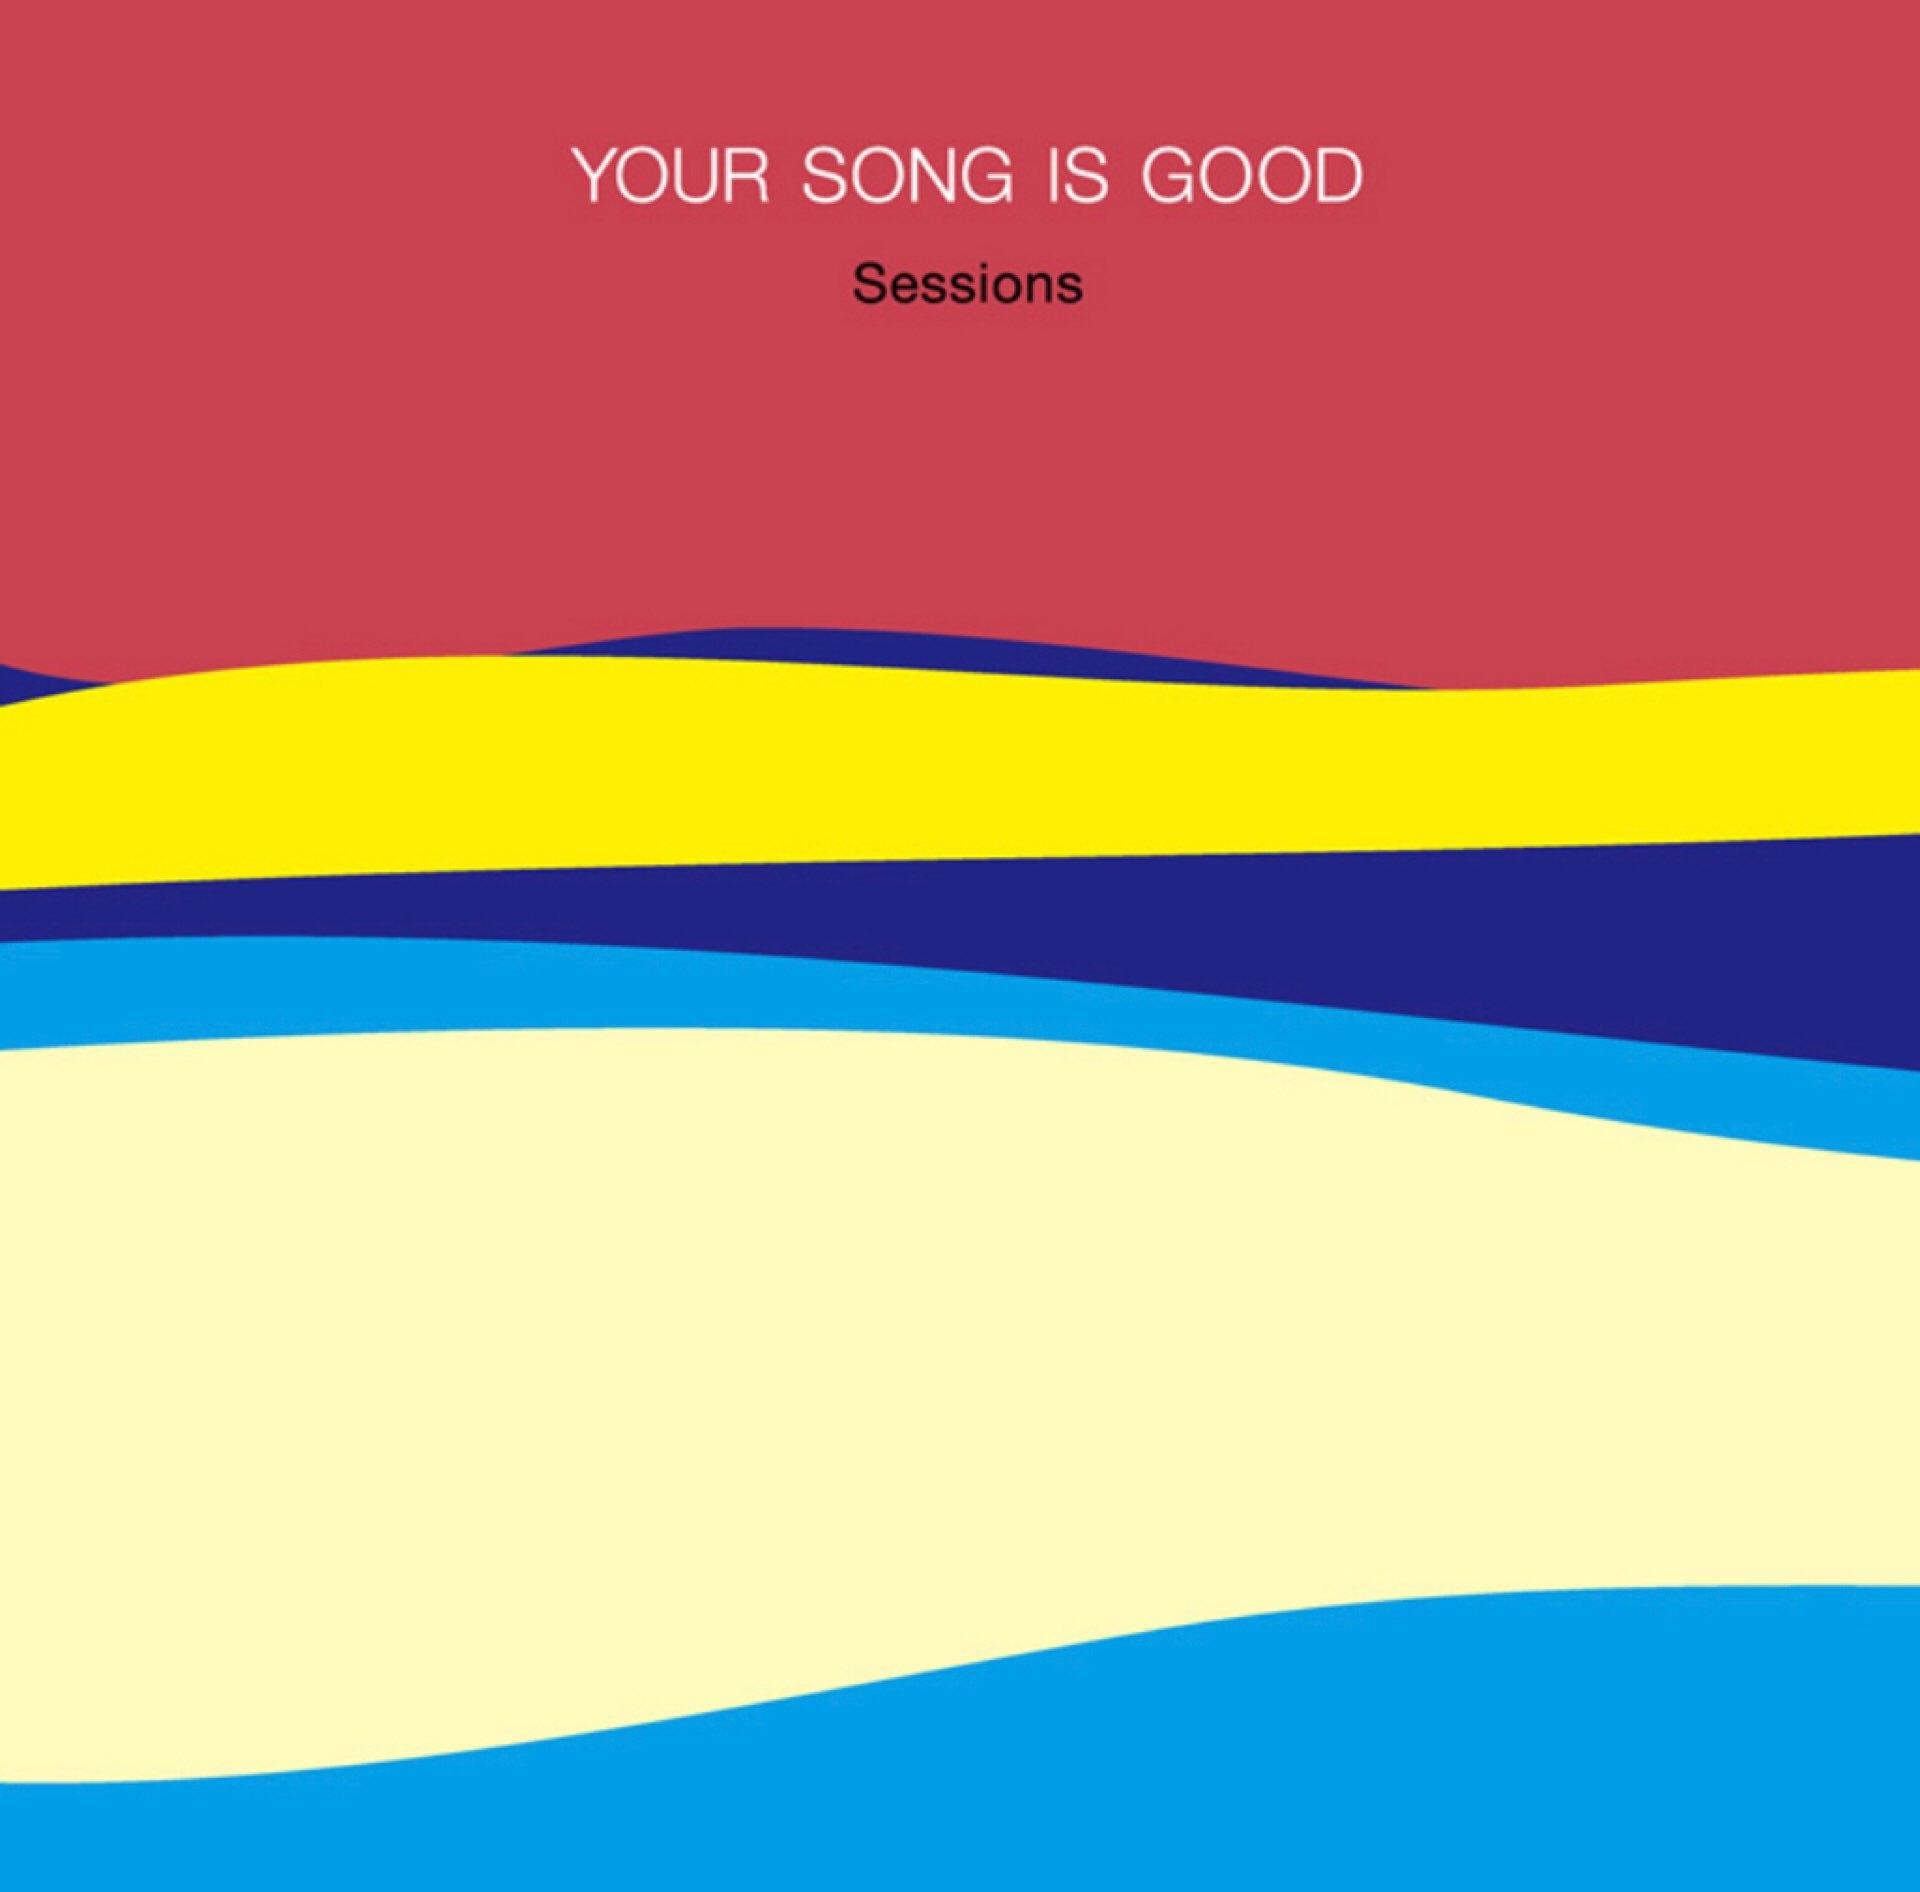 YSIGニューアルバムSessionsがリリースされました_e0230090_07483346.jpeg